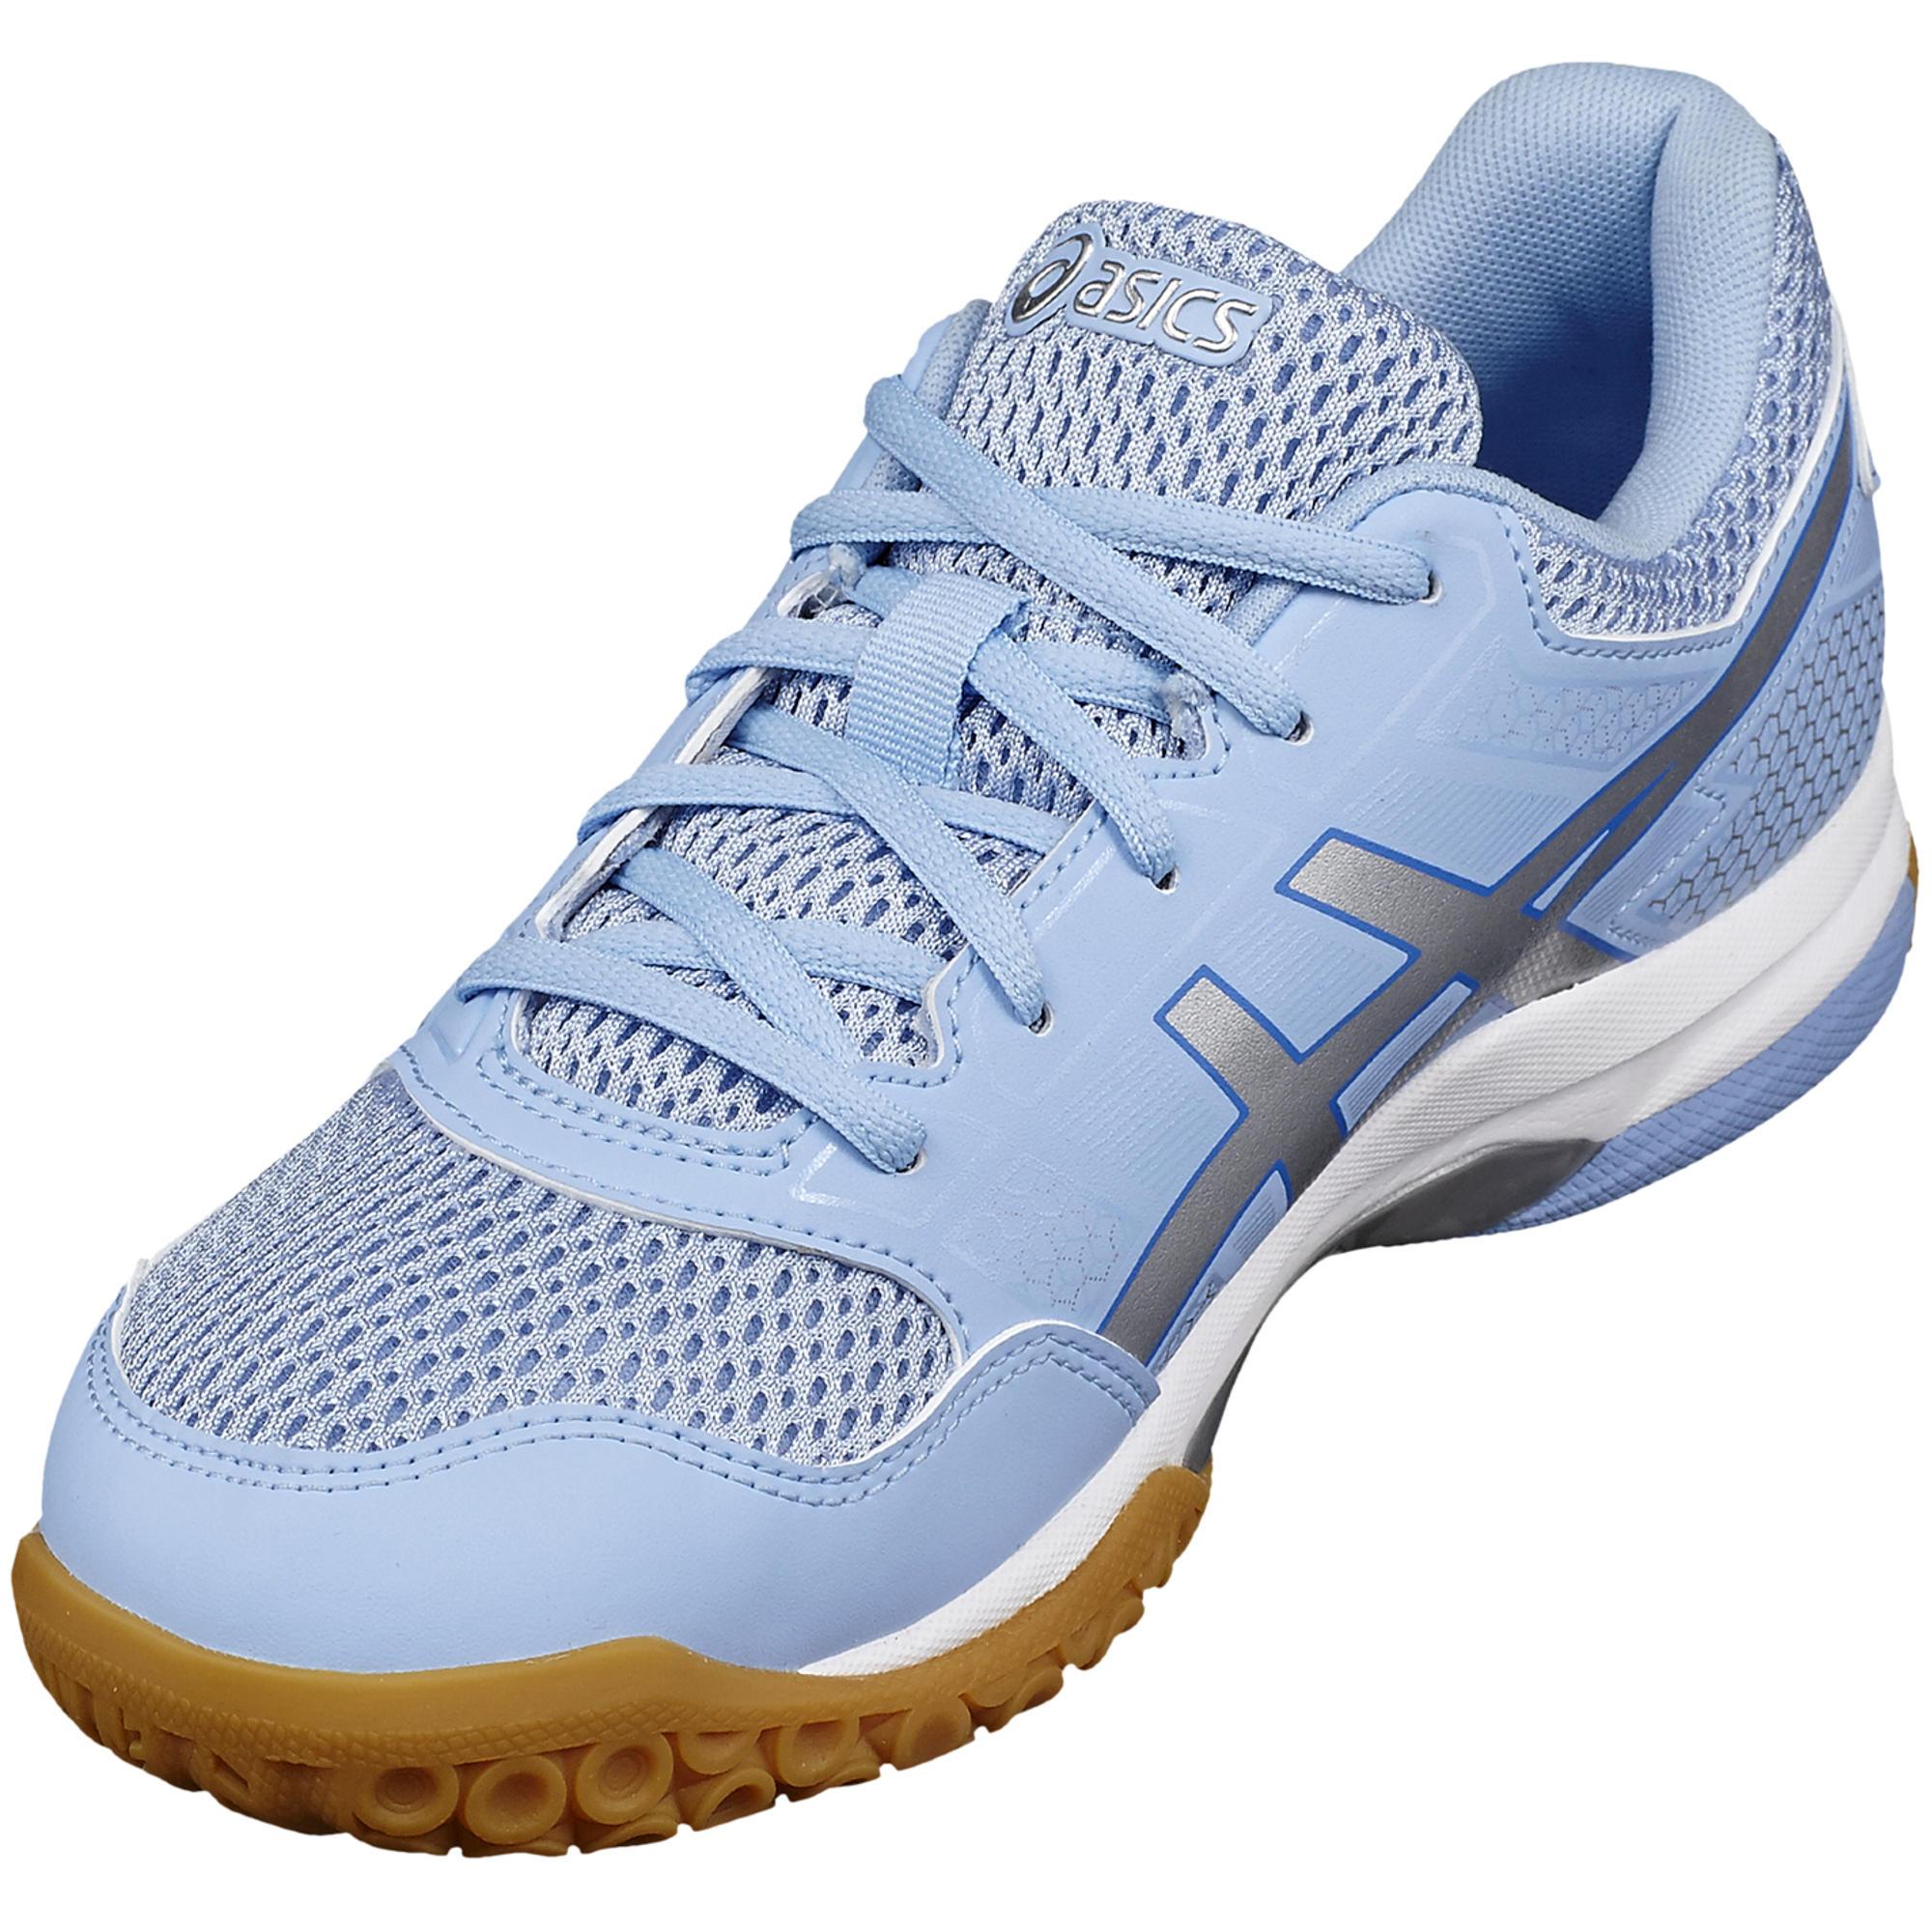 Badminton Gel Femme Bleu Blanc Rocket De Chaussures Squash 7 cFKJTu13l5